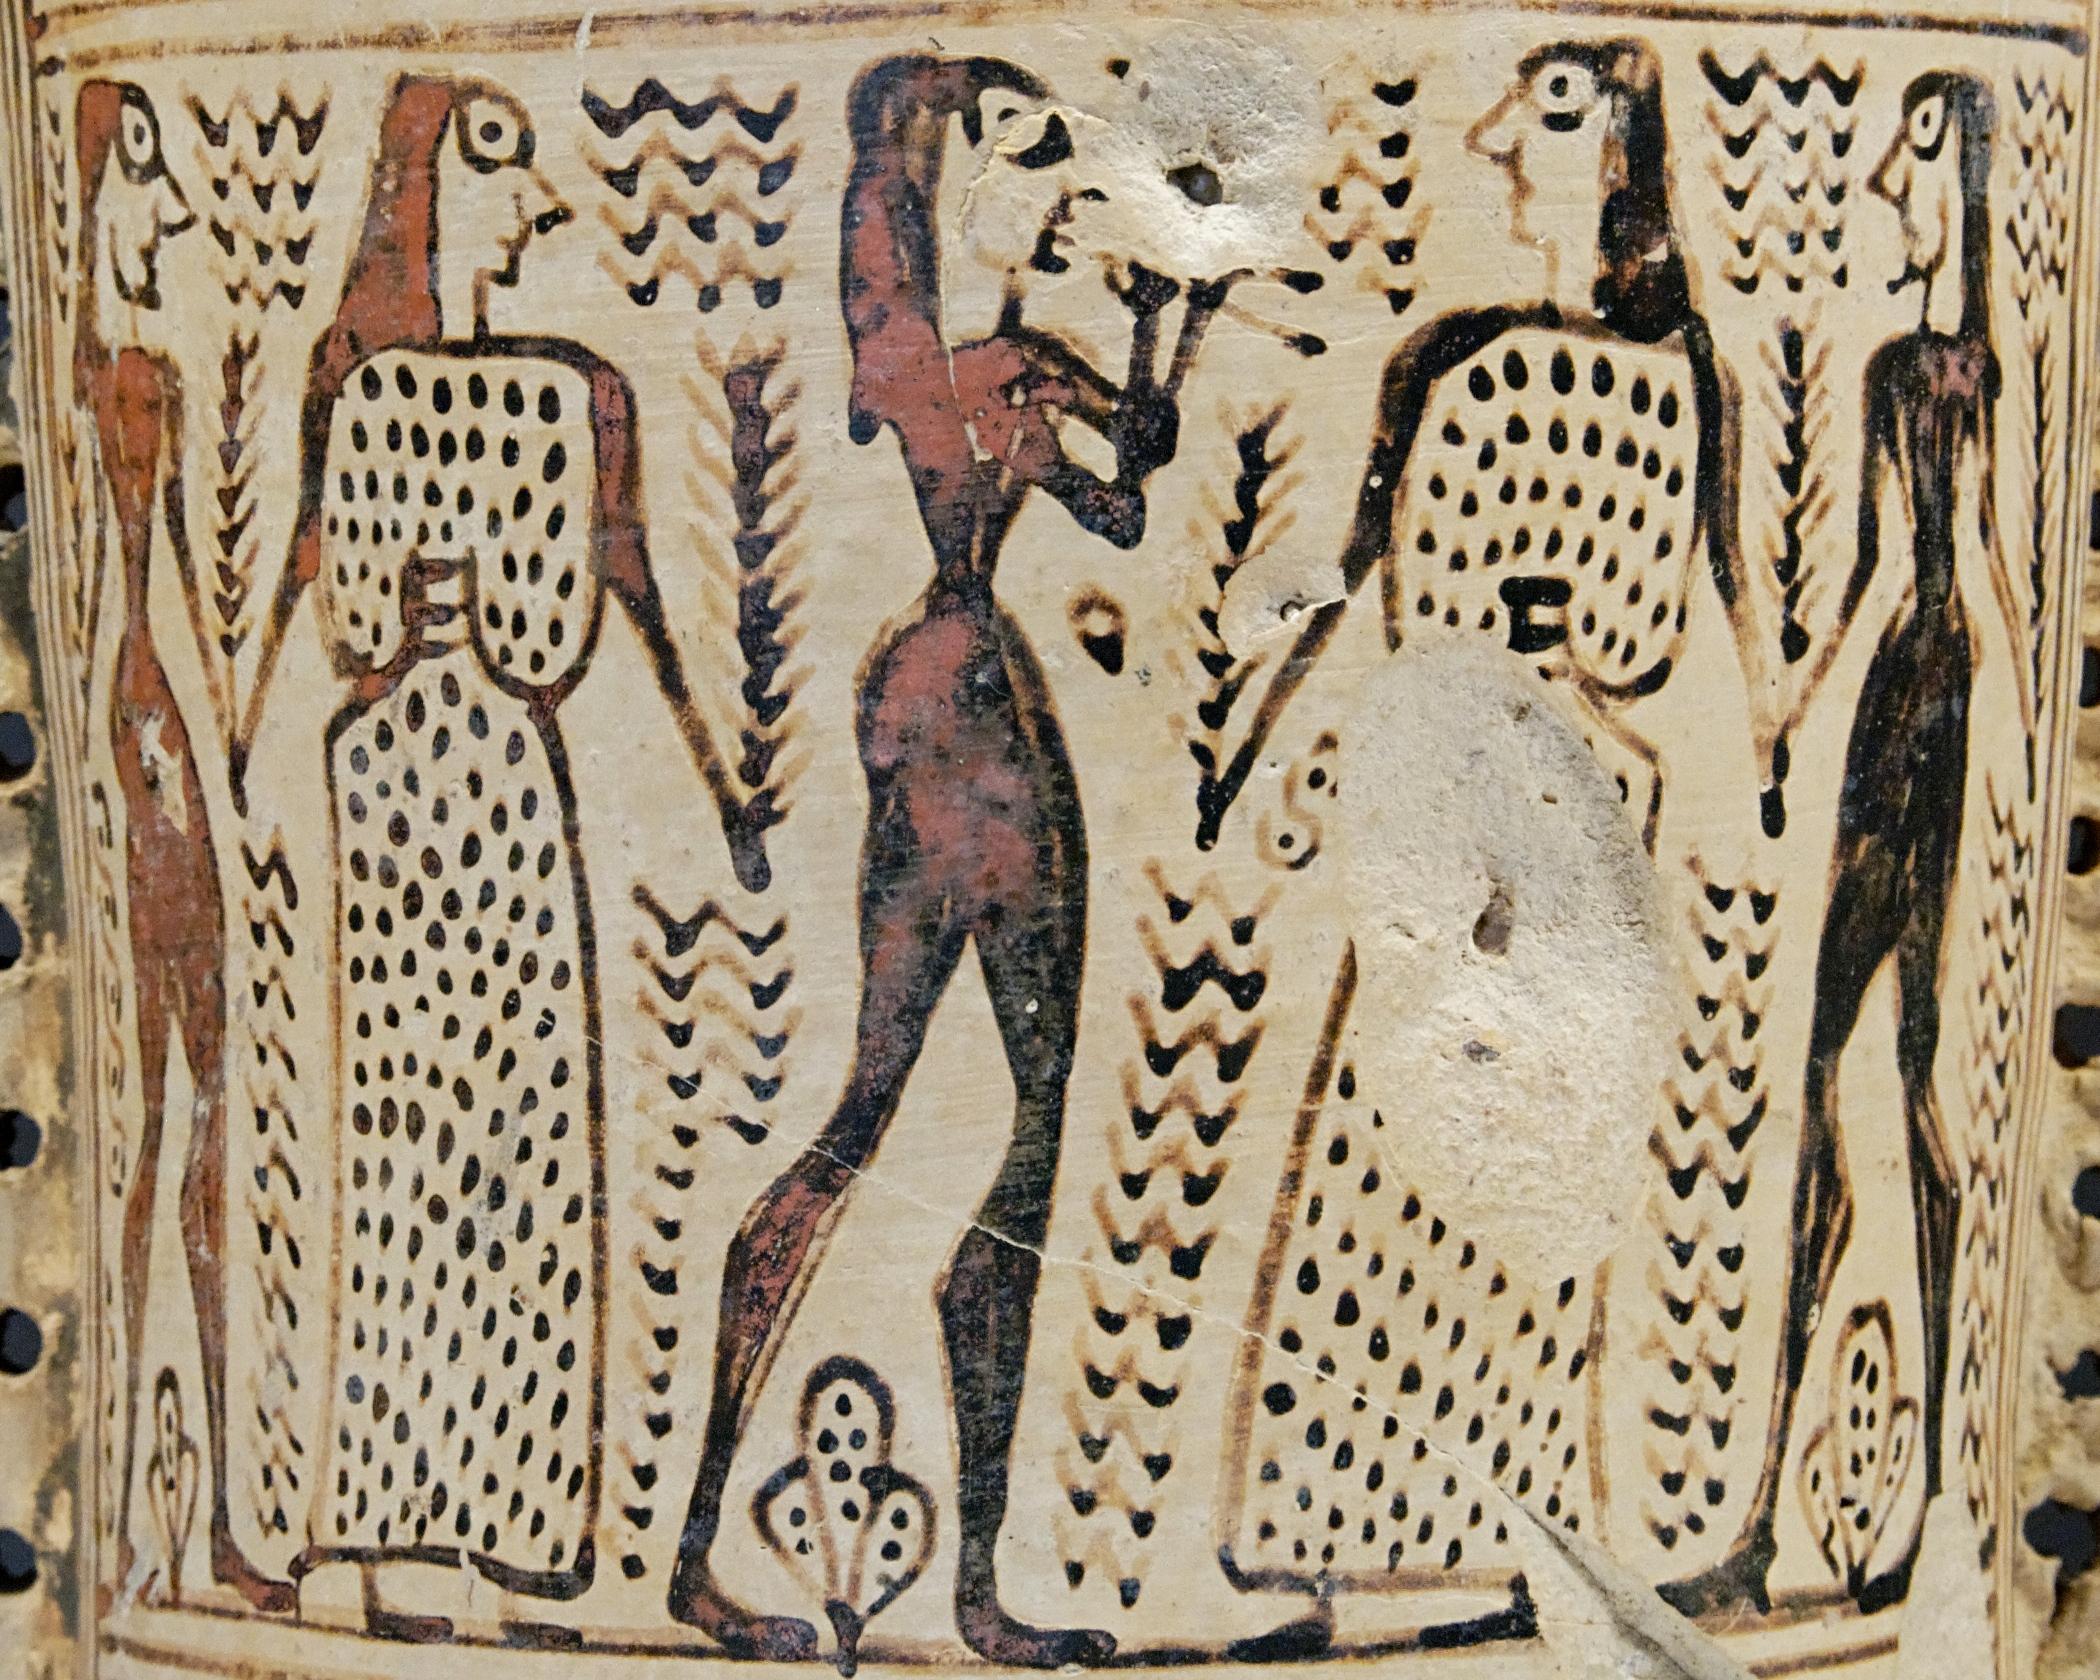 720 BC